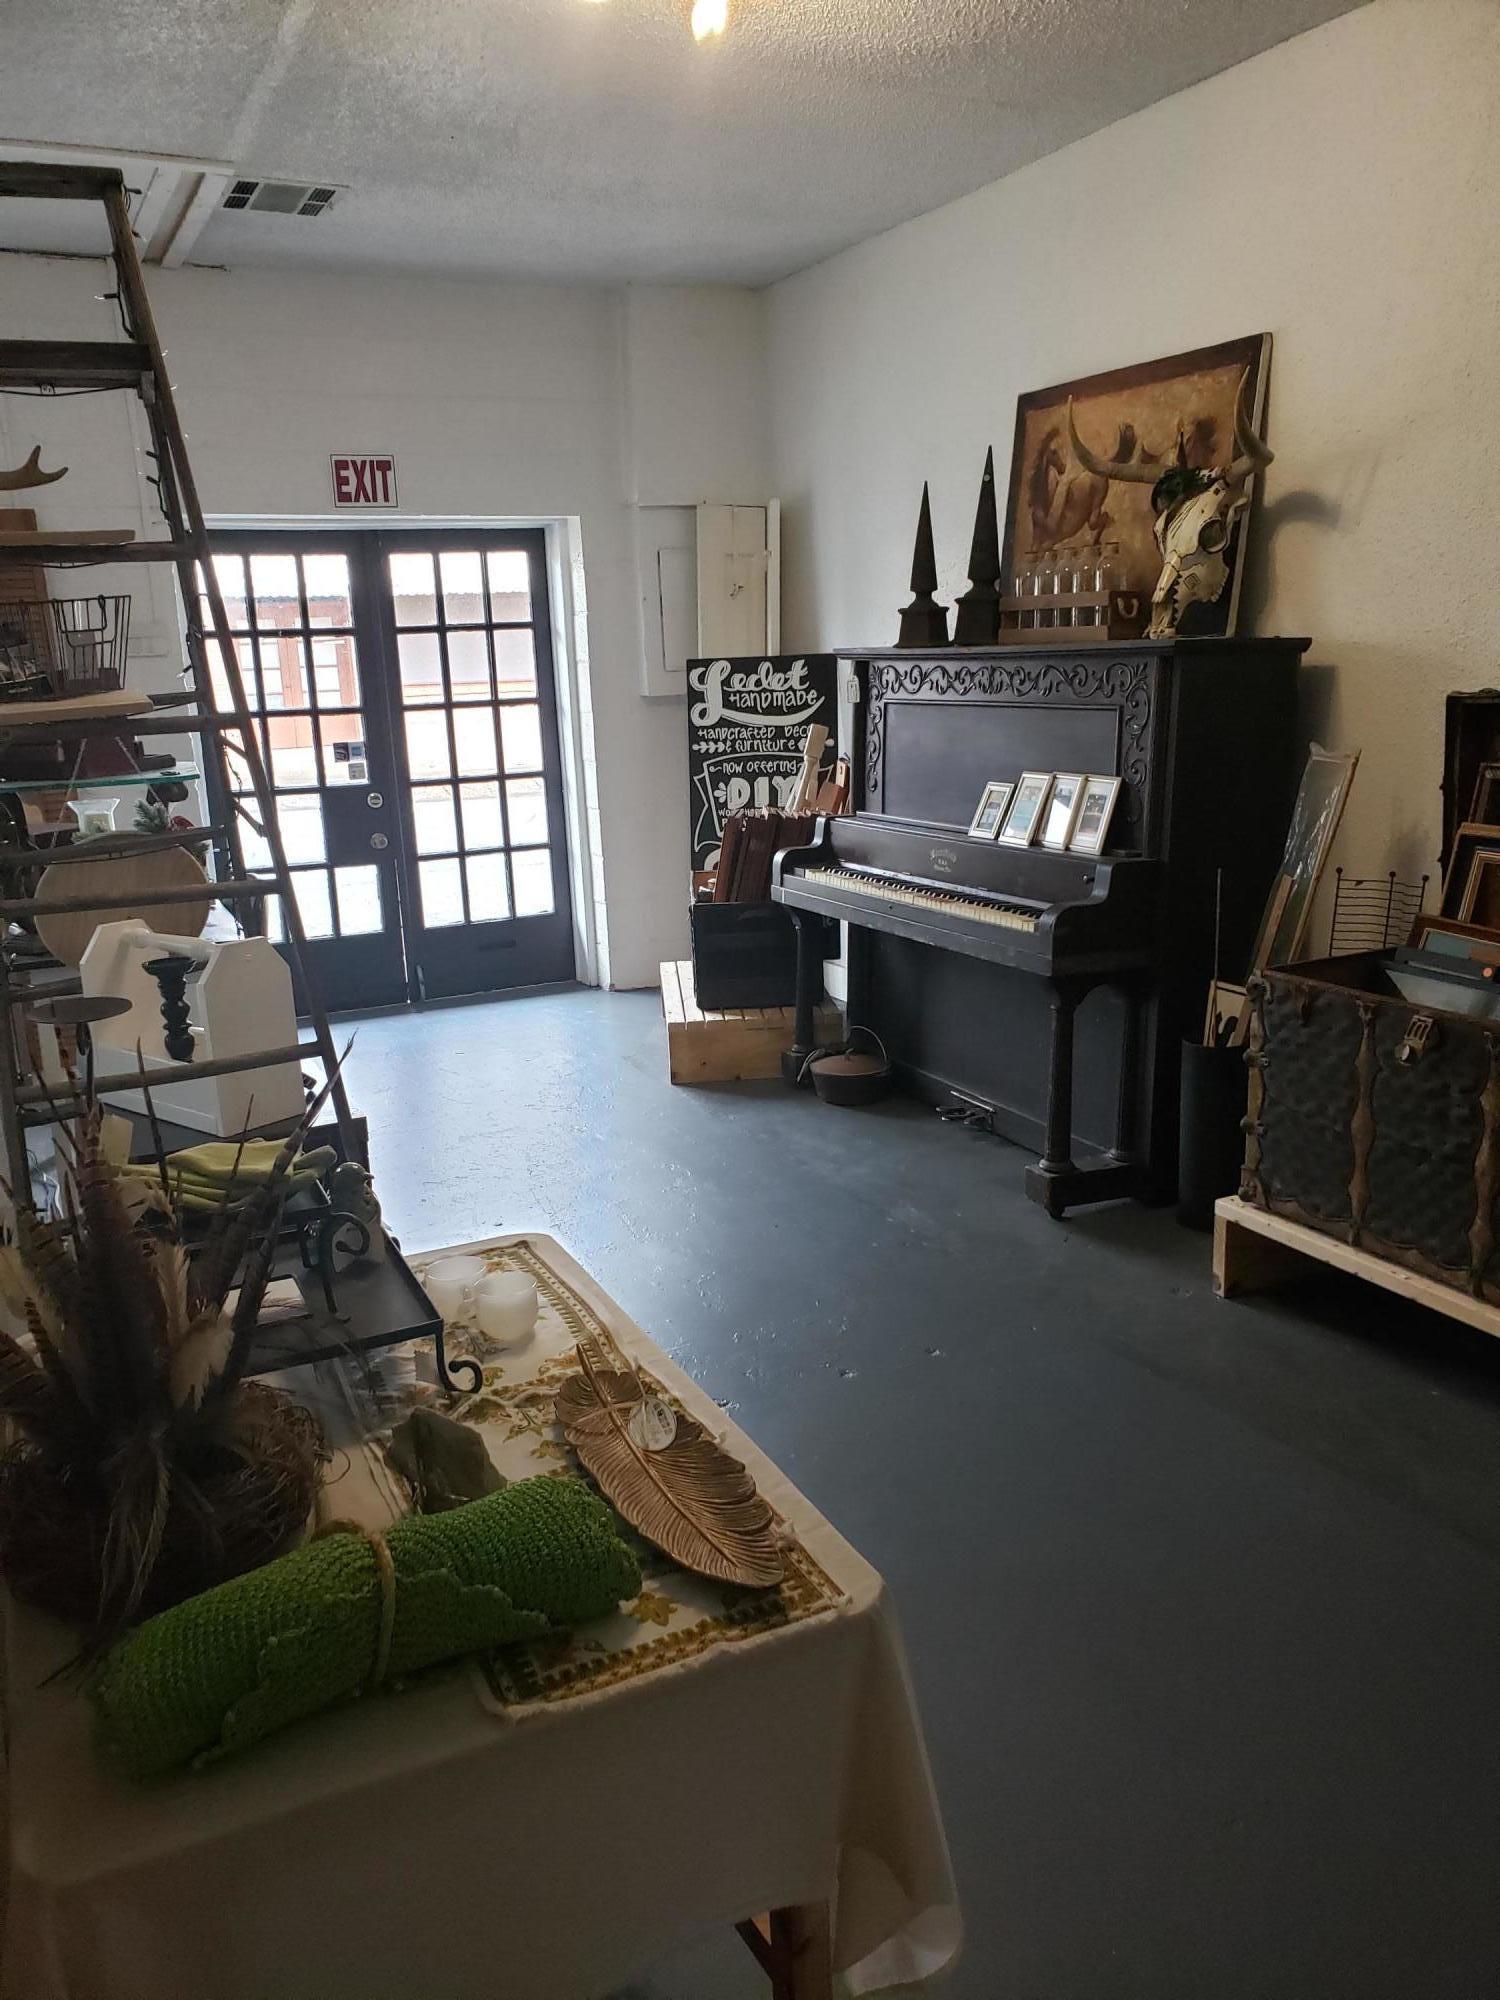 Leesville commercial property for sale, 406 S 3rd St, Leesville LA - $125,000